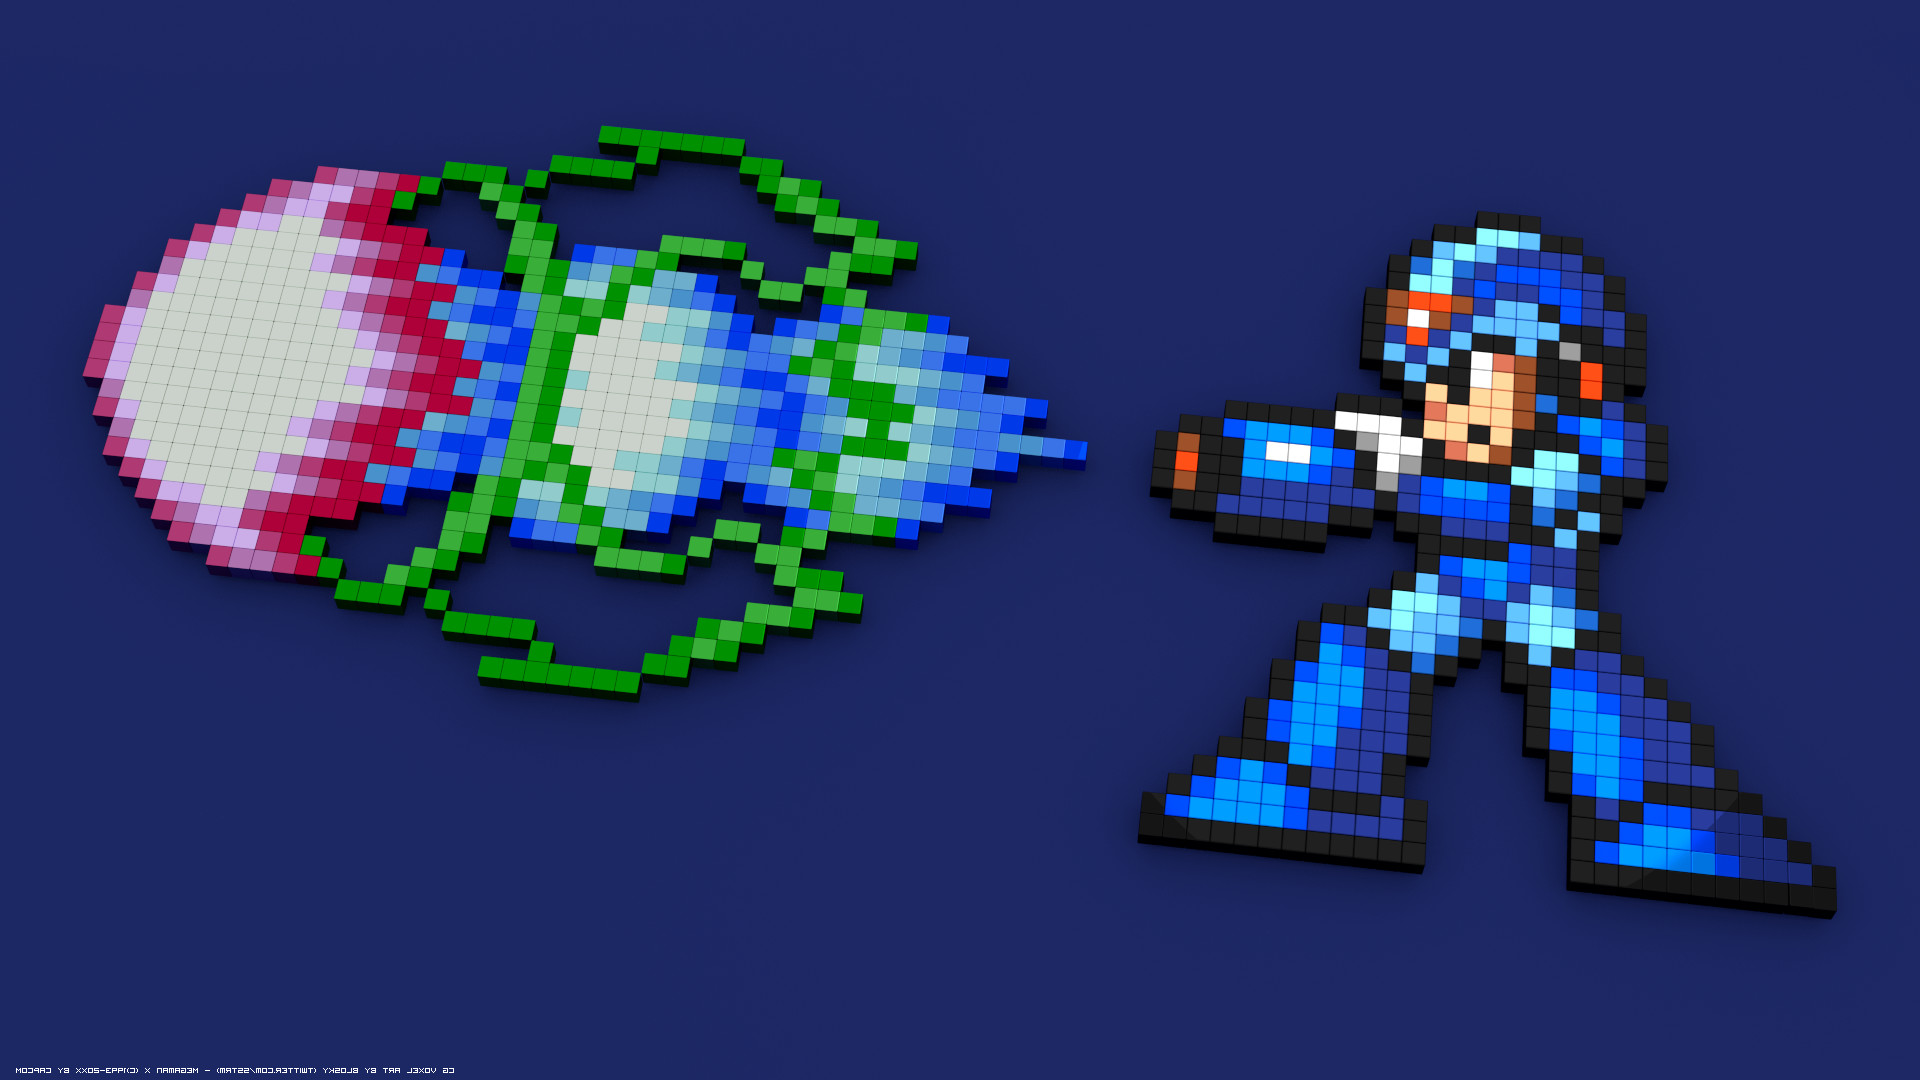 Megaman X, 16 bit, 8 bit, Pixelated, Pixel Art, 3D Blocks